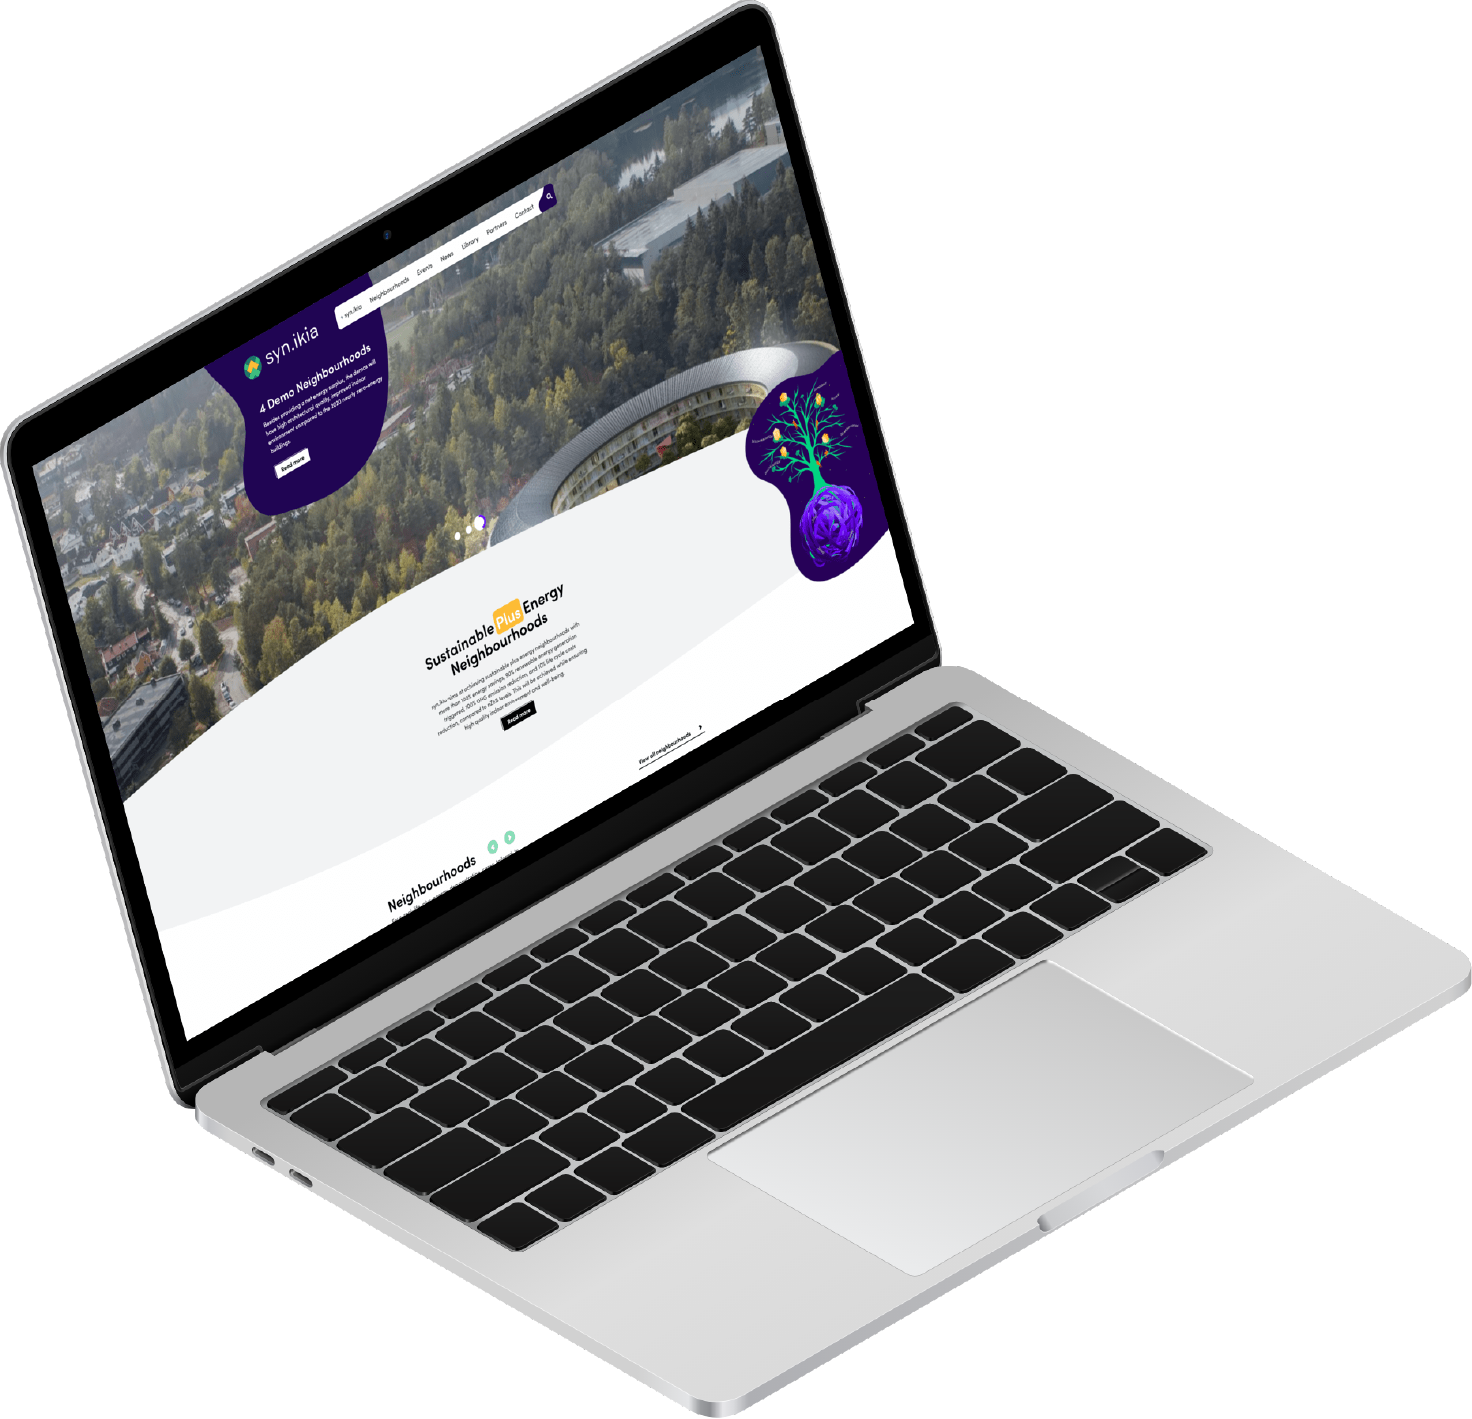 Synikia-website-laten-maken